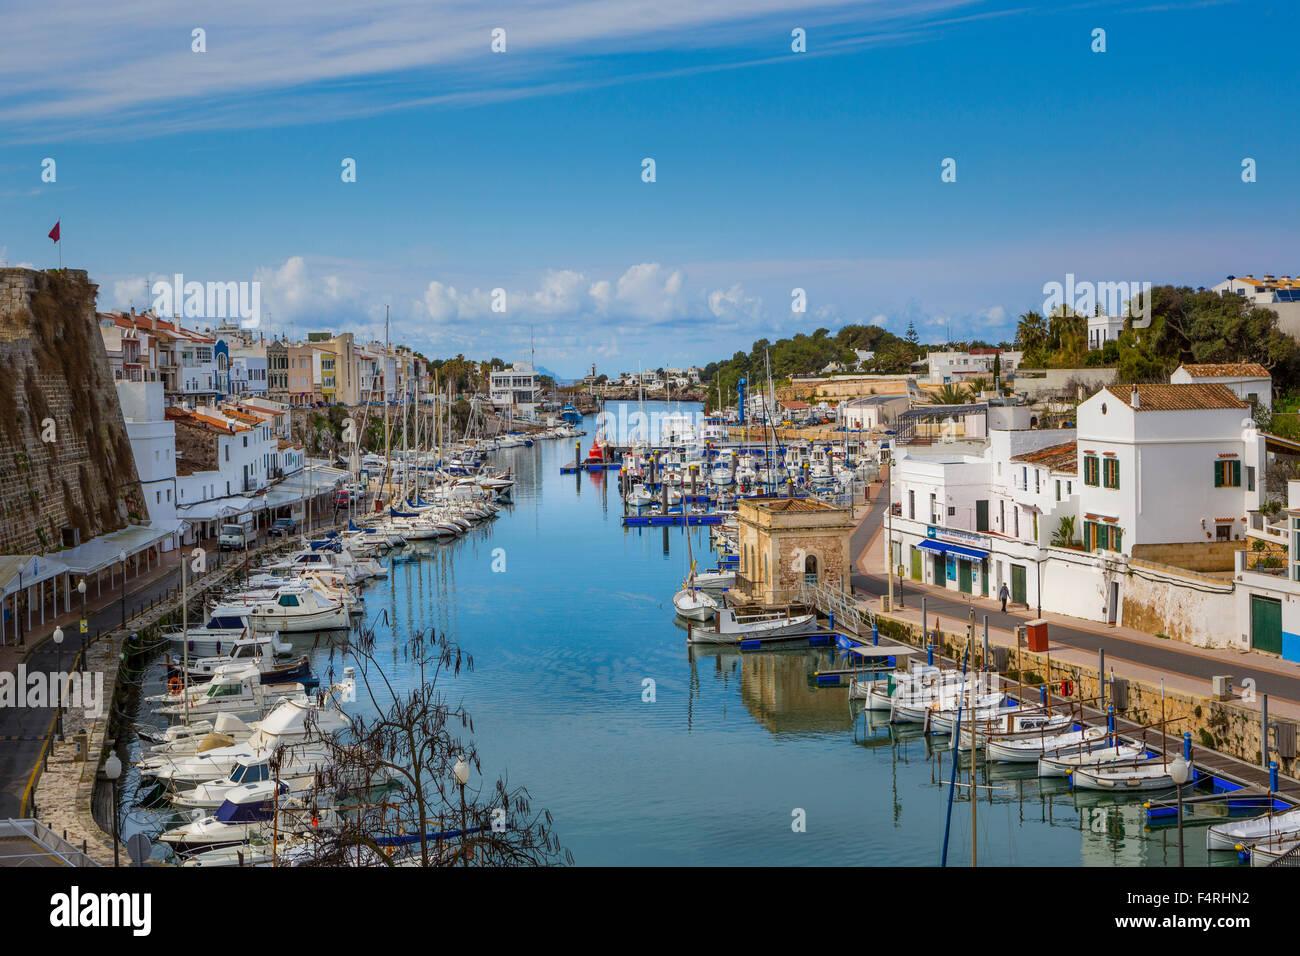 Building, Ciutadella, Landscape, Menorca, Balearics, Spring, architecture, bay, boats, Mediterranean, no people, - Stock Image